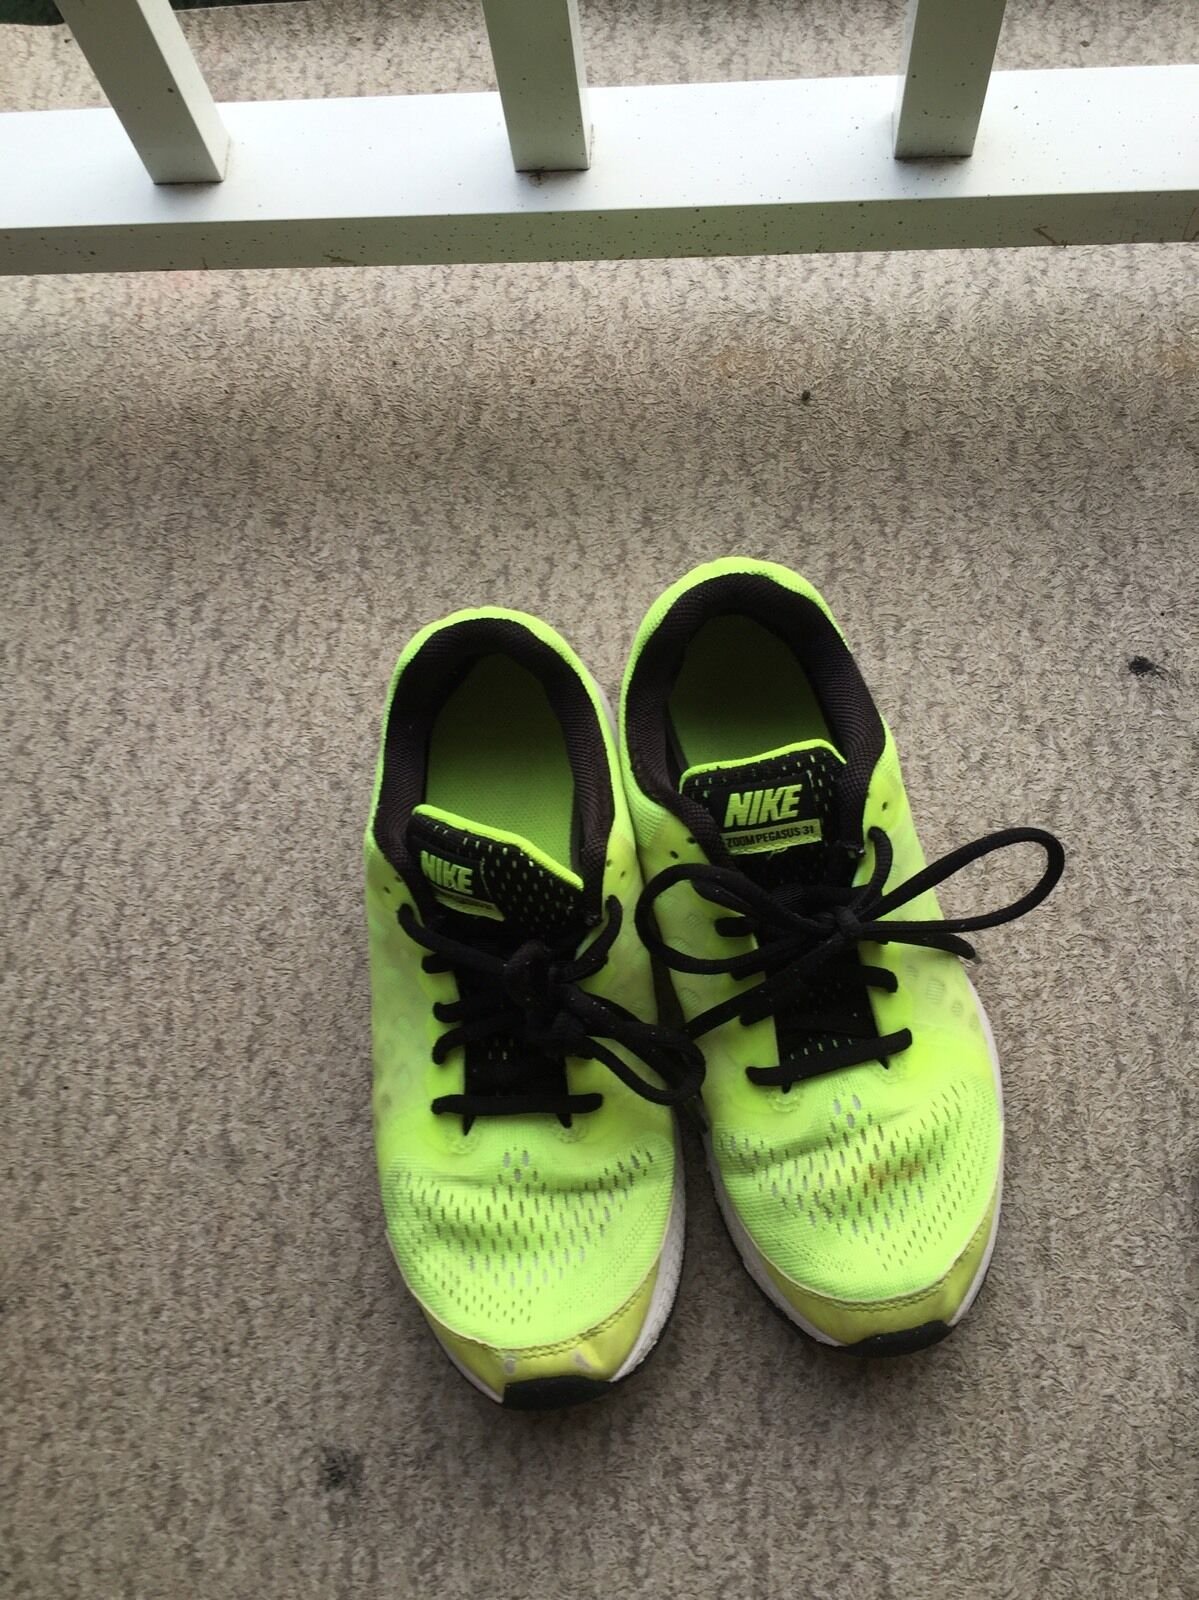 on sale 09dcd a0d06 Nike Zoom Pegasus 31 31 31 Boys US Size 5 2919c5